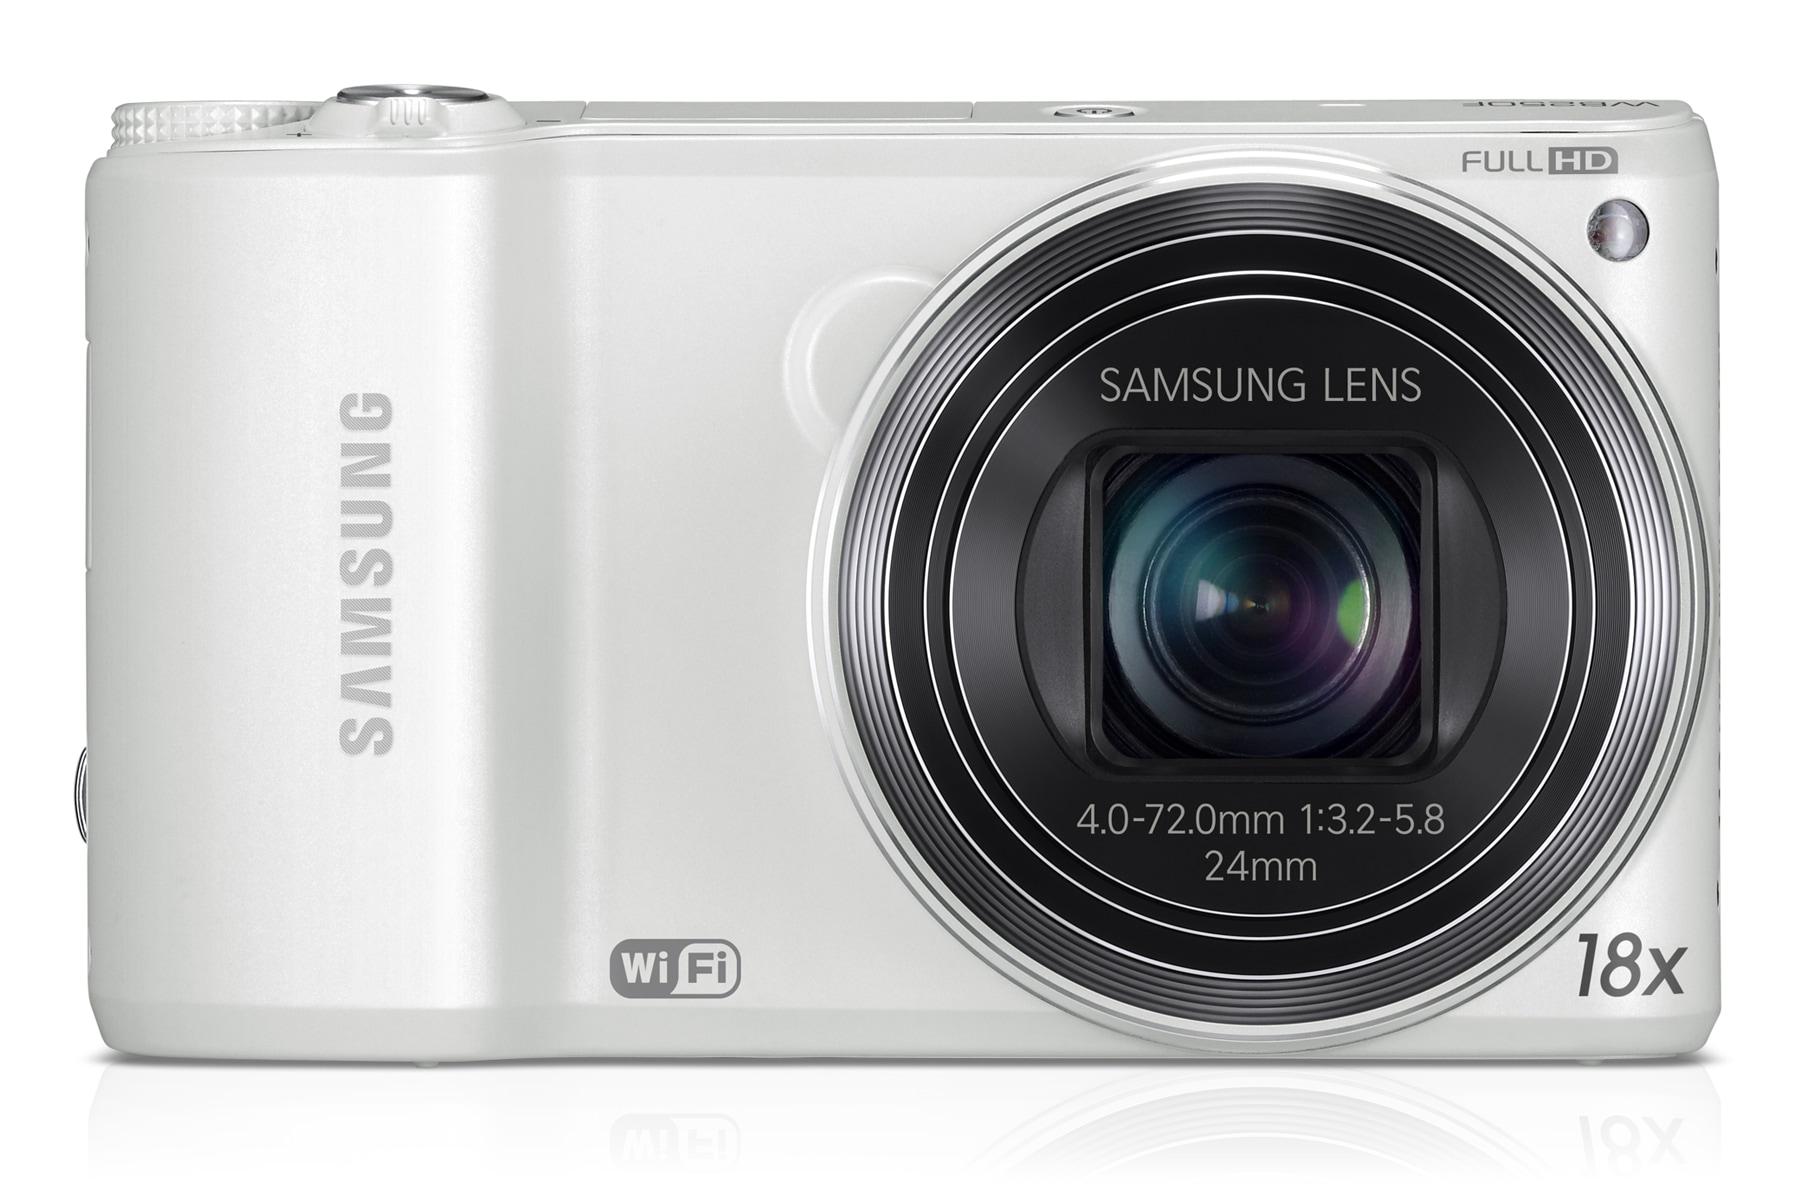 Samsung WB250f Digital Camera price in Pakistan, Samsung ...